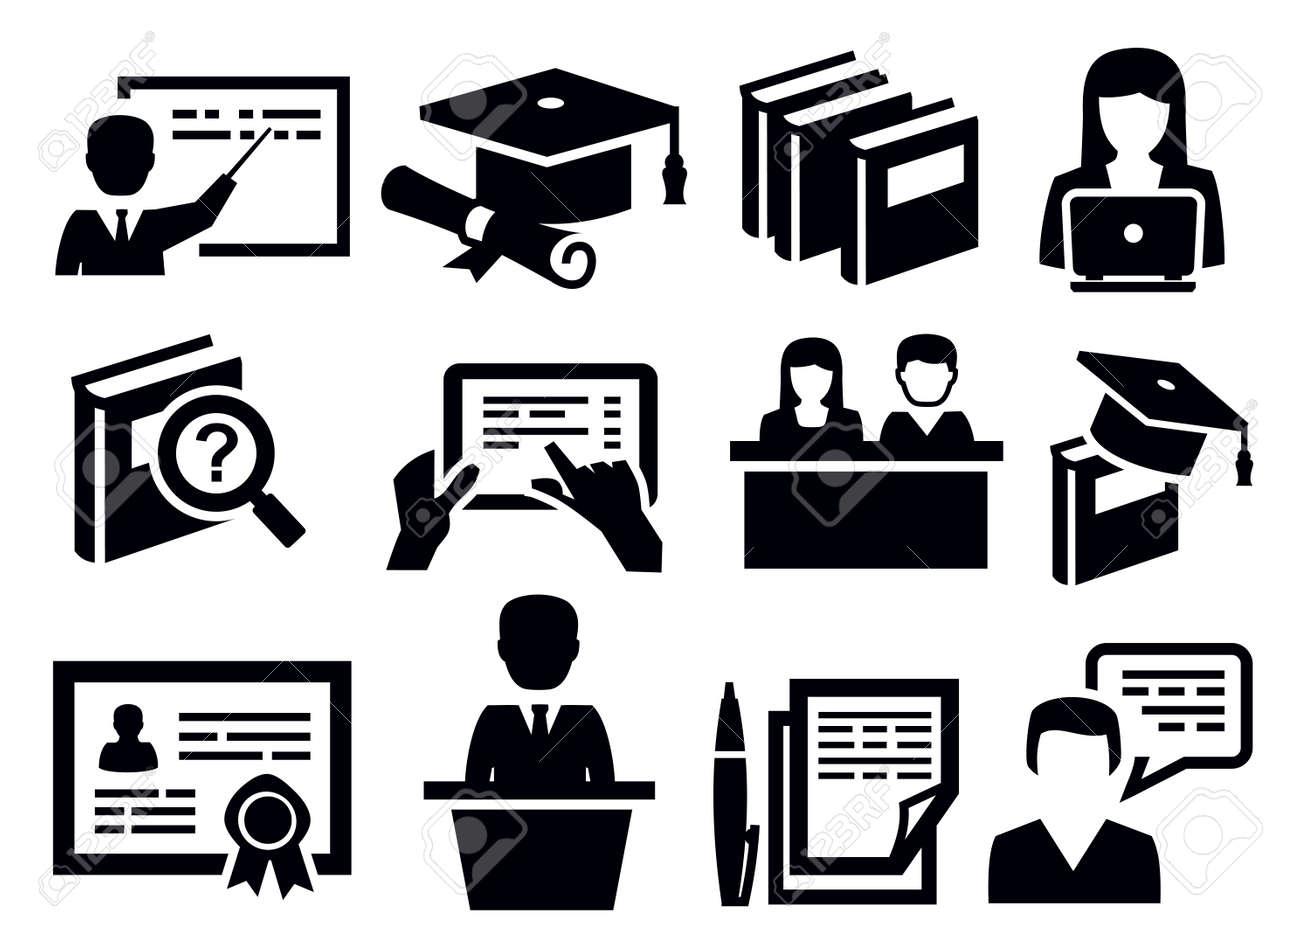 Education Icon Stock Photos Images. Royalty Free Education Icon ...